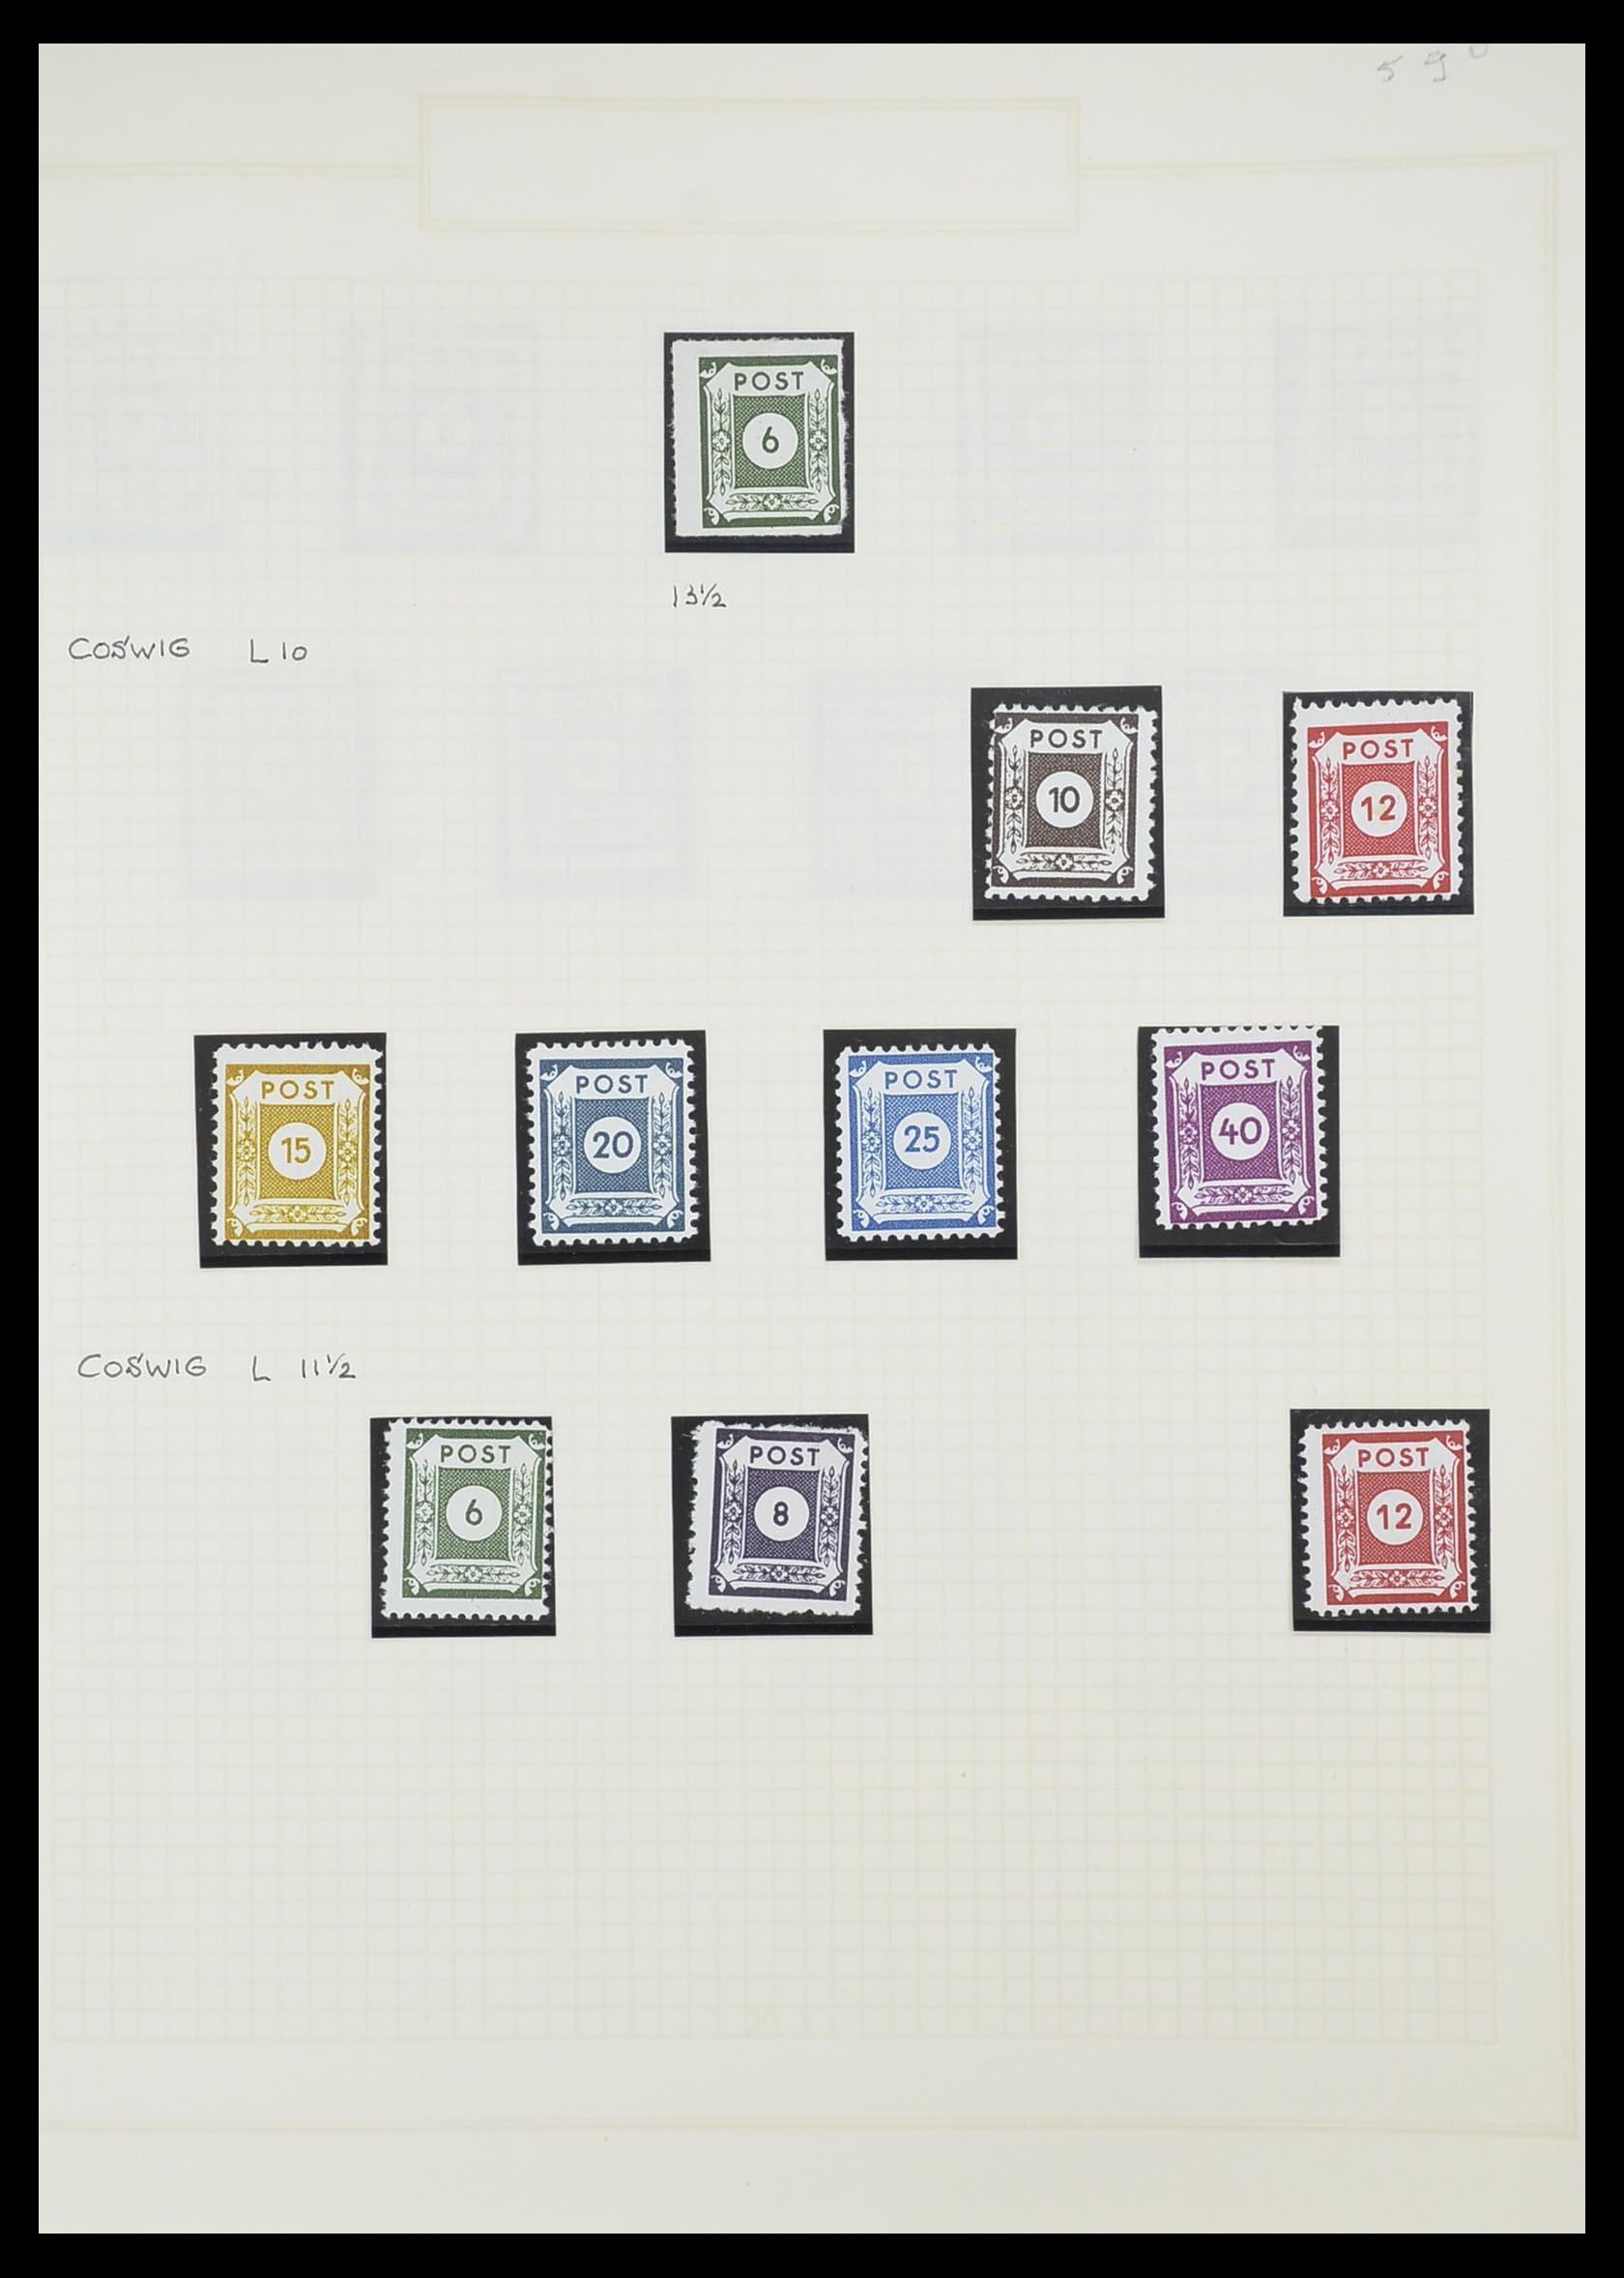 33698 017 - Postzegelverzameling 33698 Sovjet Zone 1945-1948.